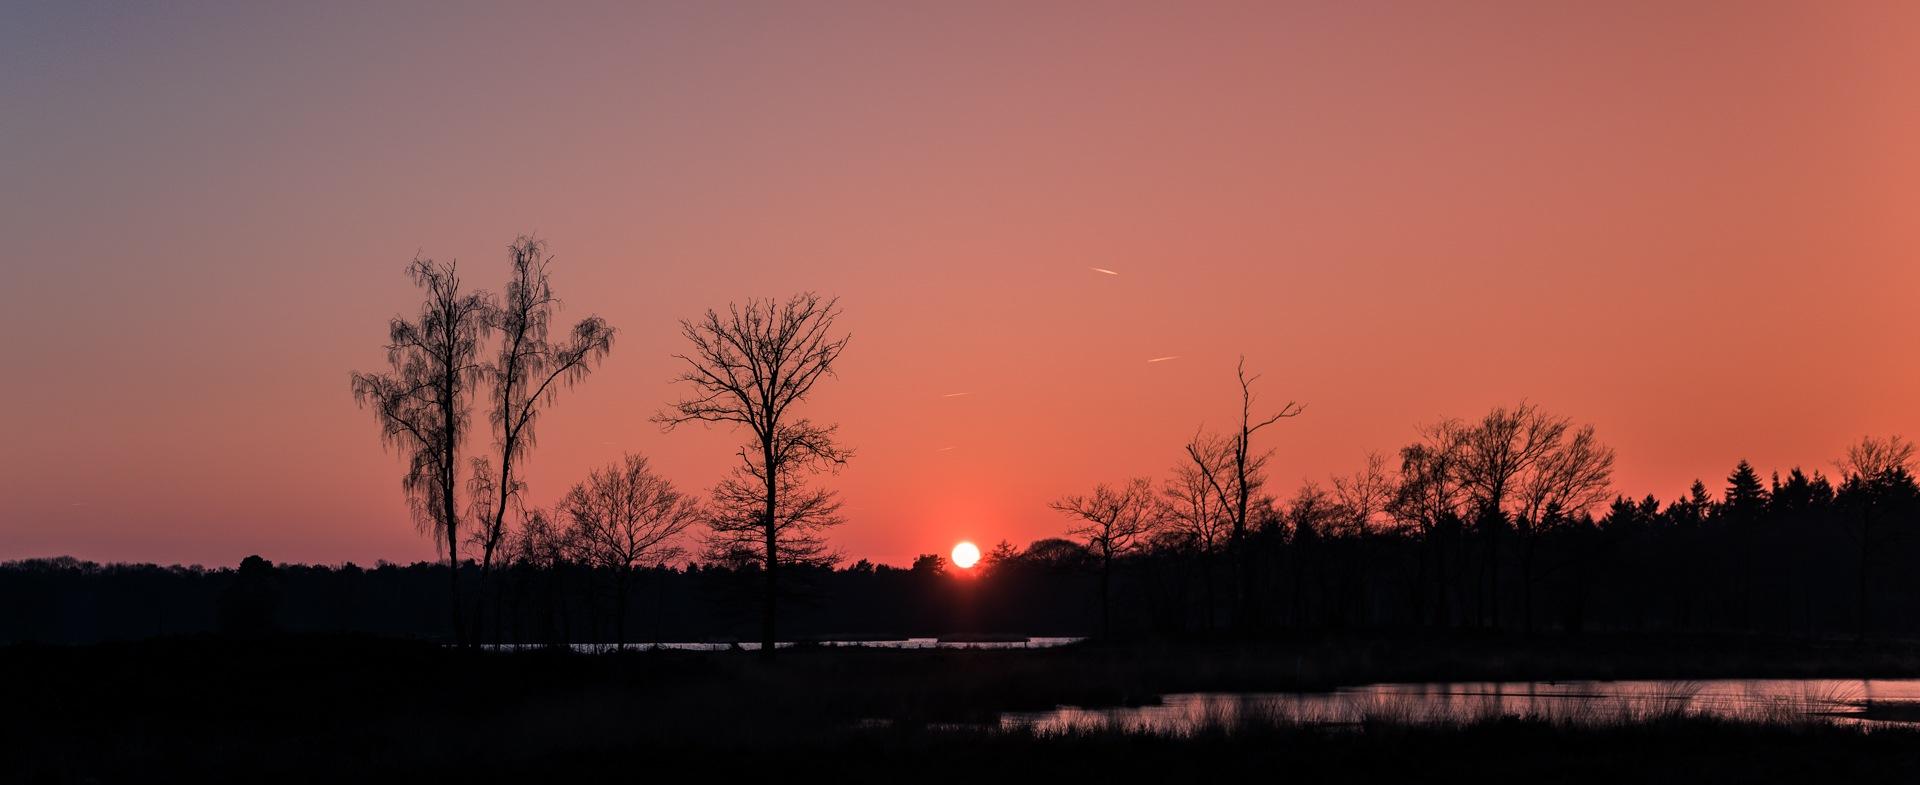 winterglow by Gilbert de Bruijn